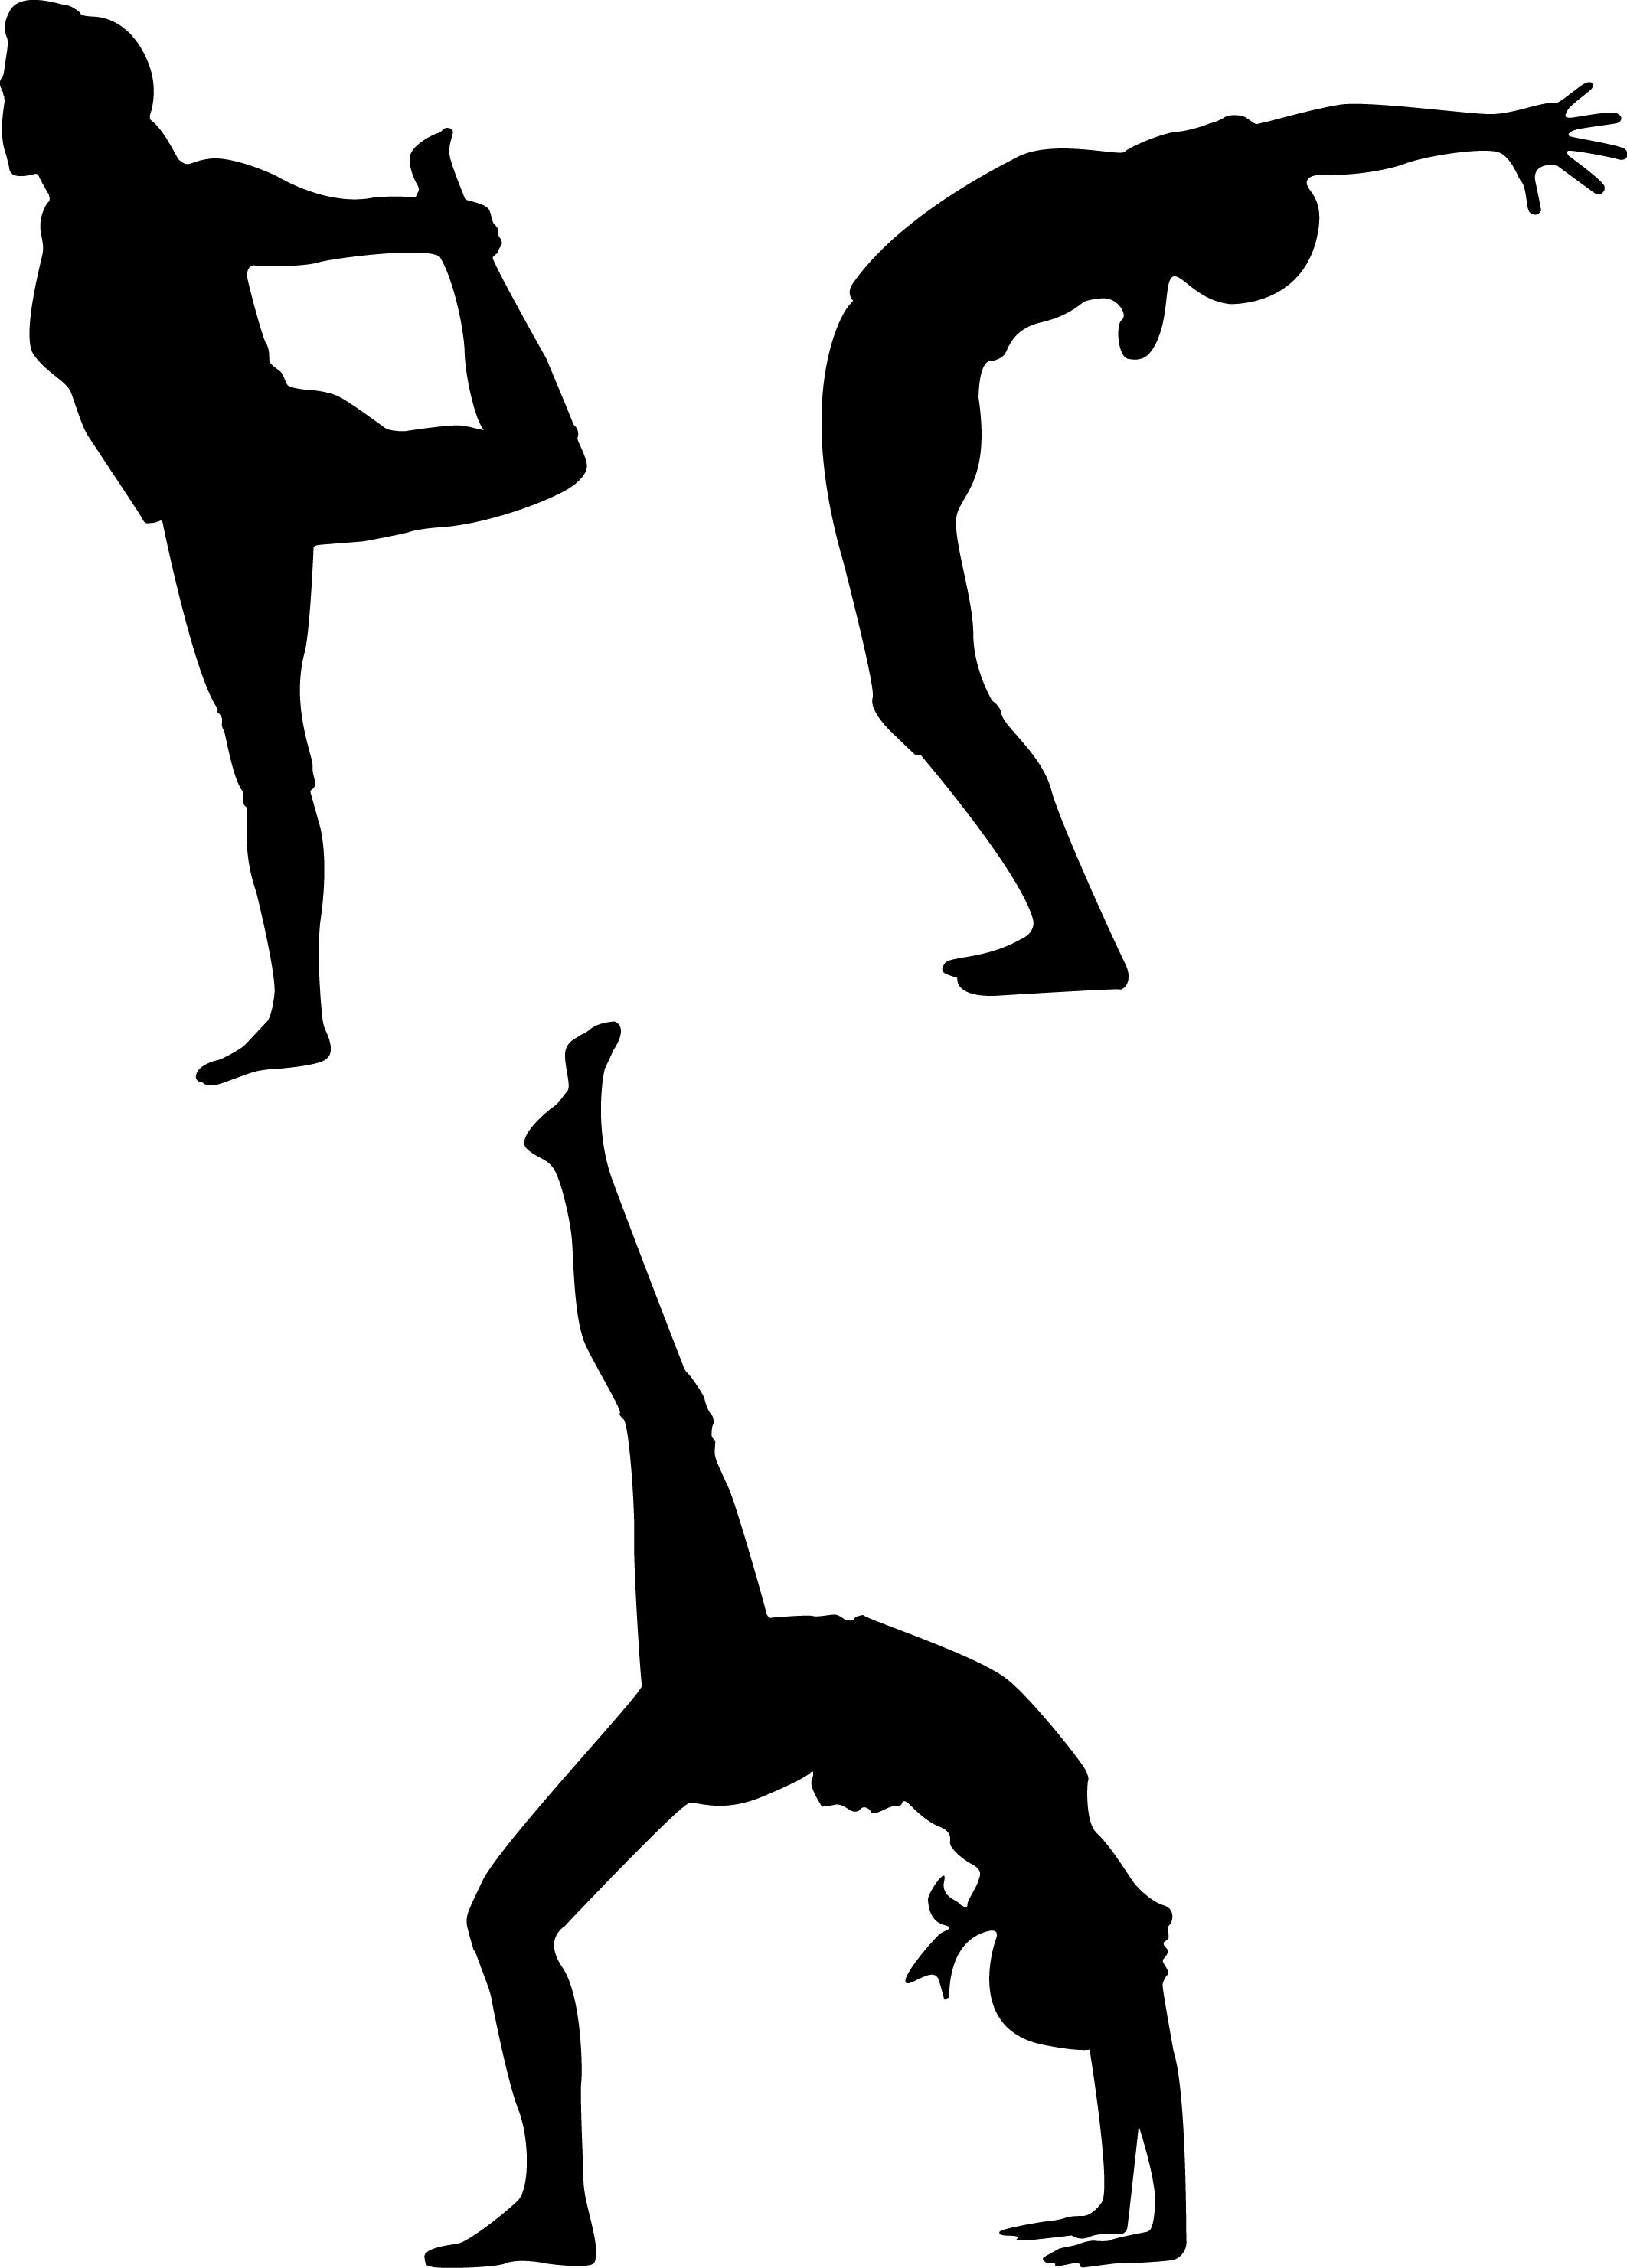 yoga-silhouette-series-2-1428607